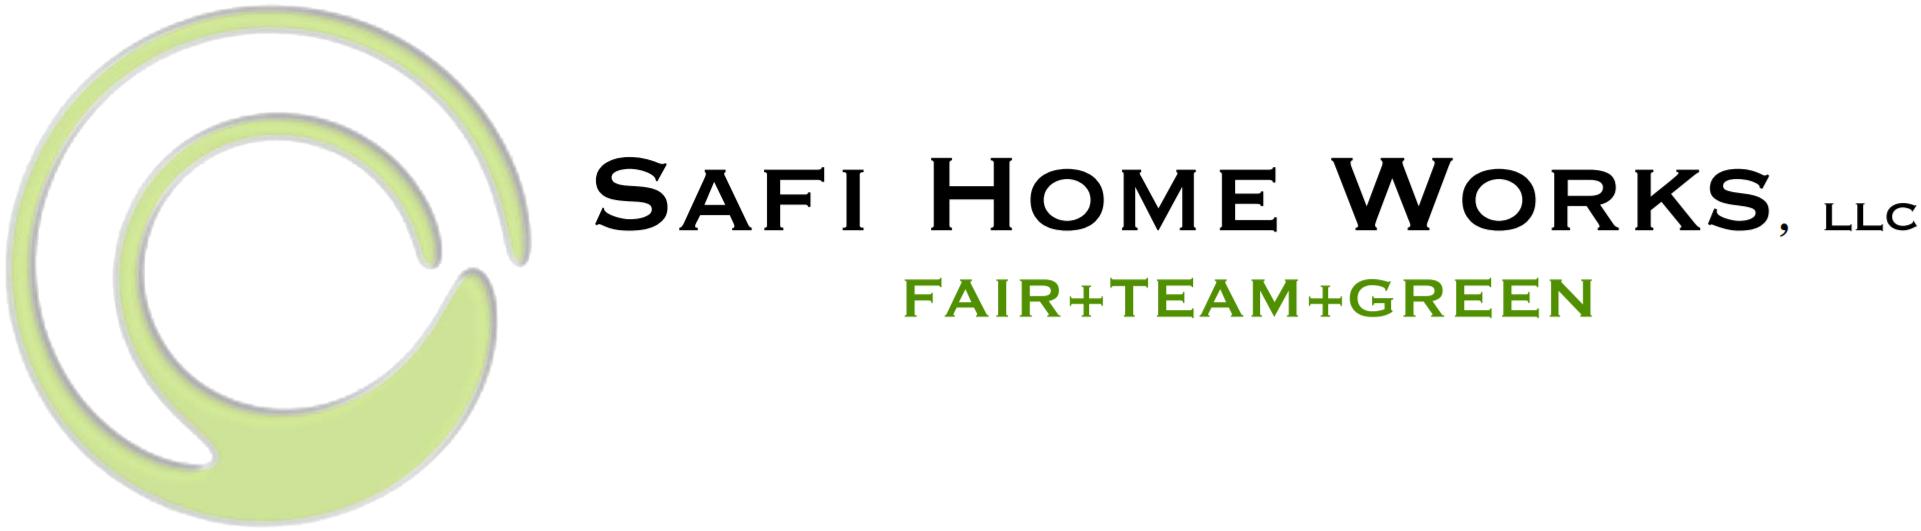 Safi Homeworks Logo